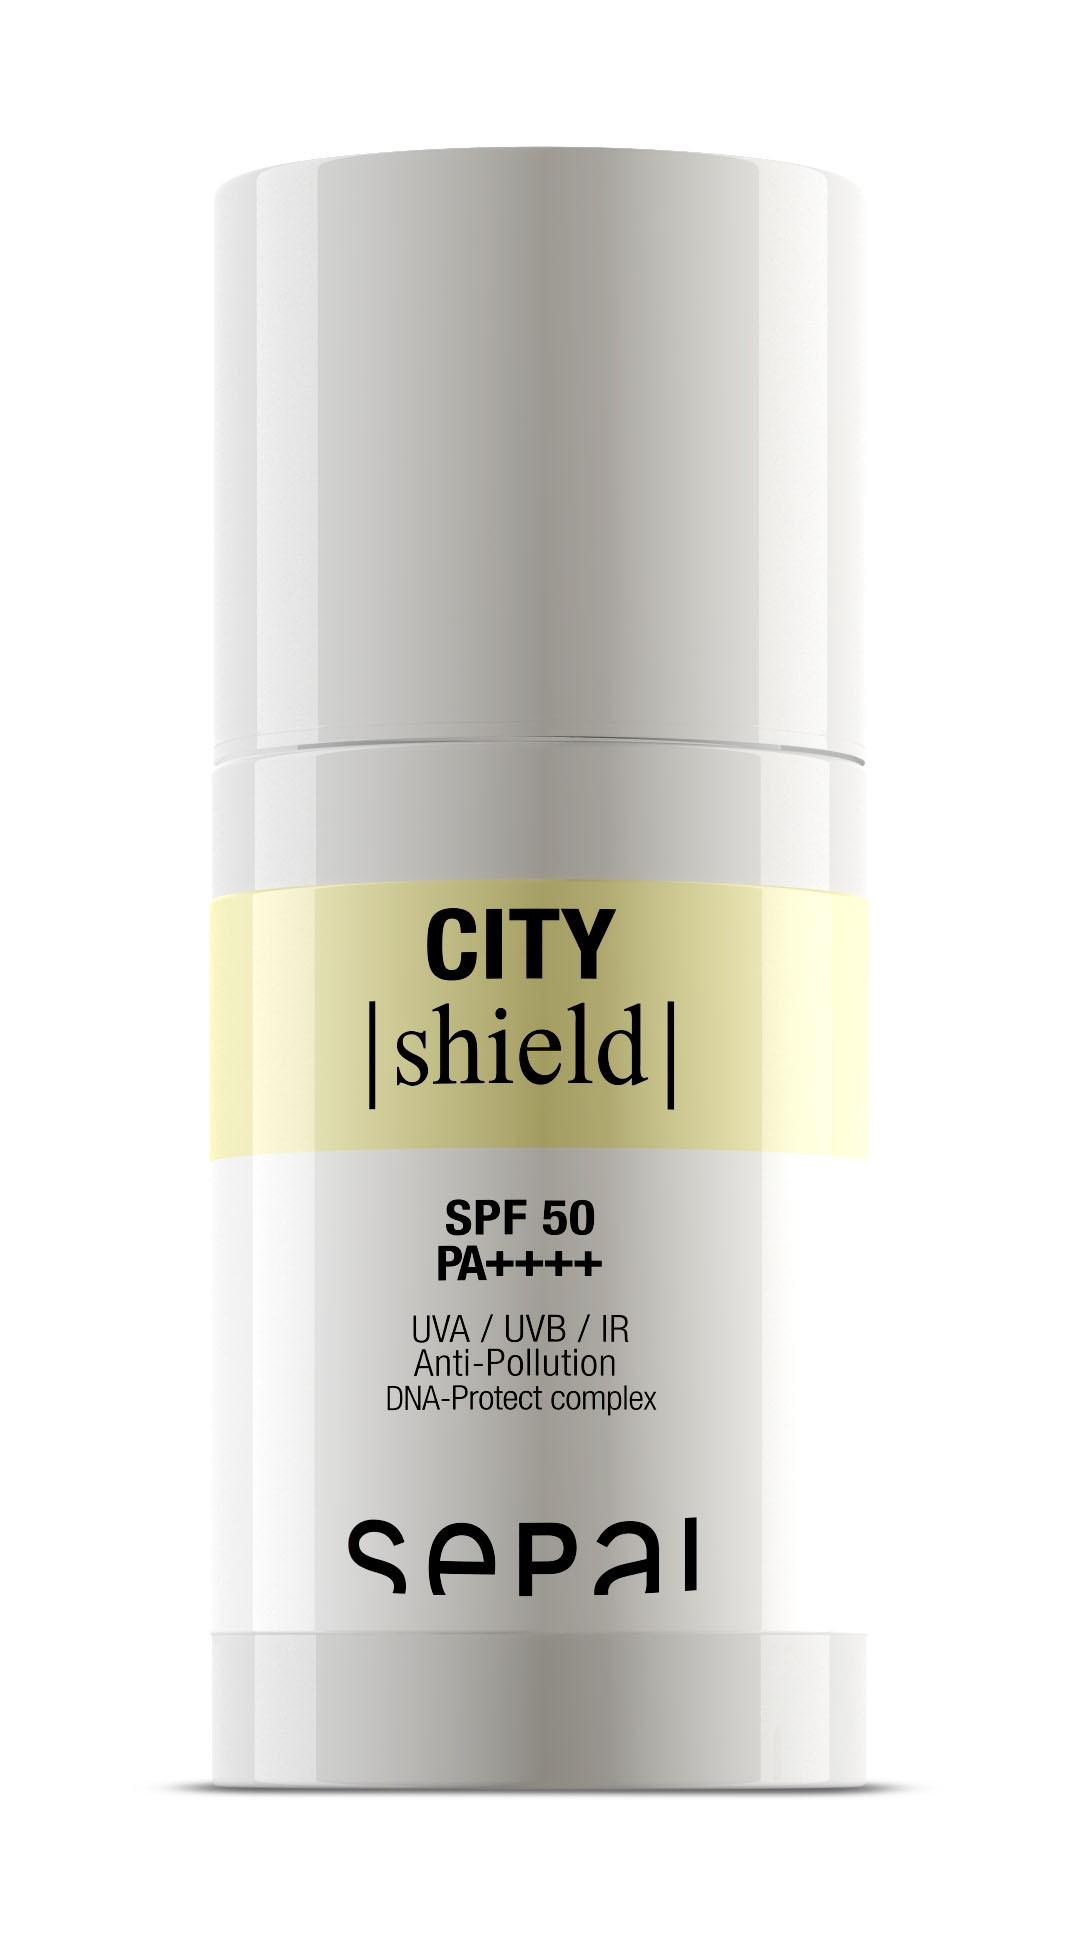 CITY Shield SPF 50  - SEPAI